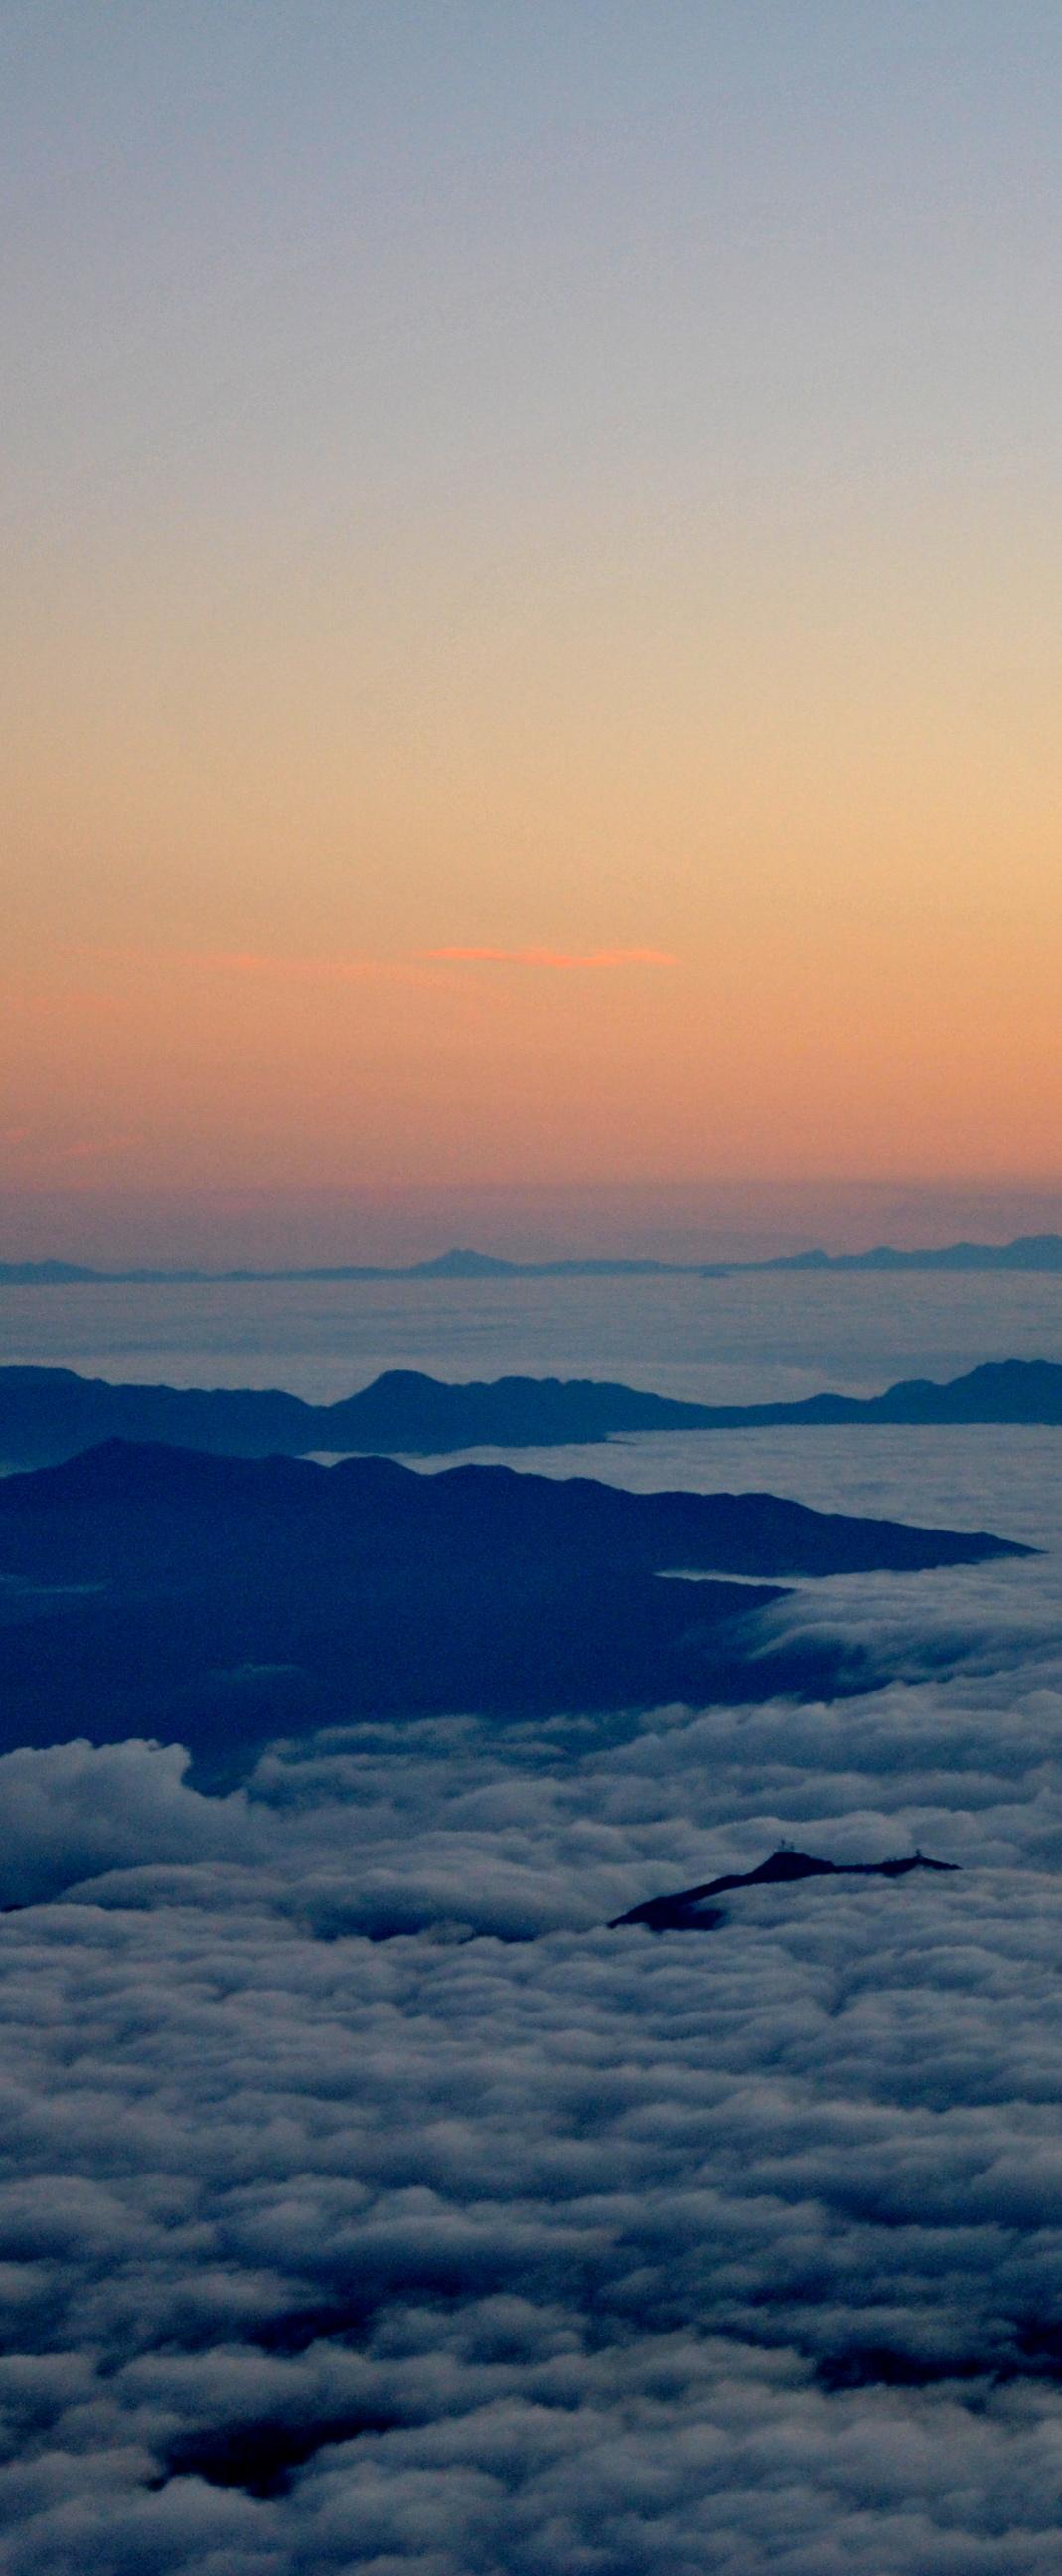 Sunrise at 13,000 ft. on the summit of Mt. Fuji